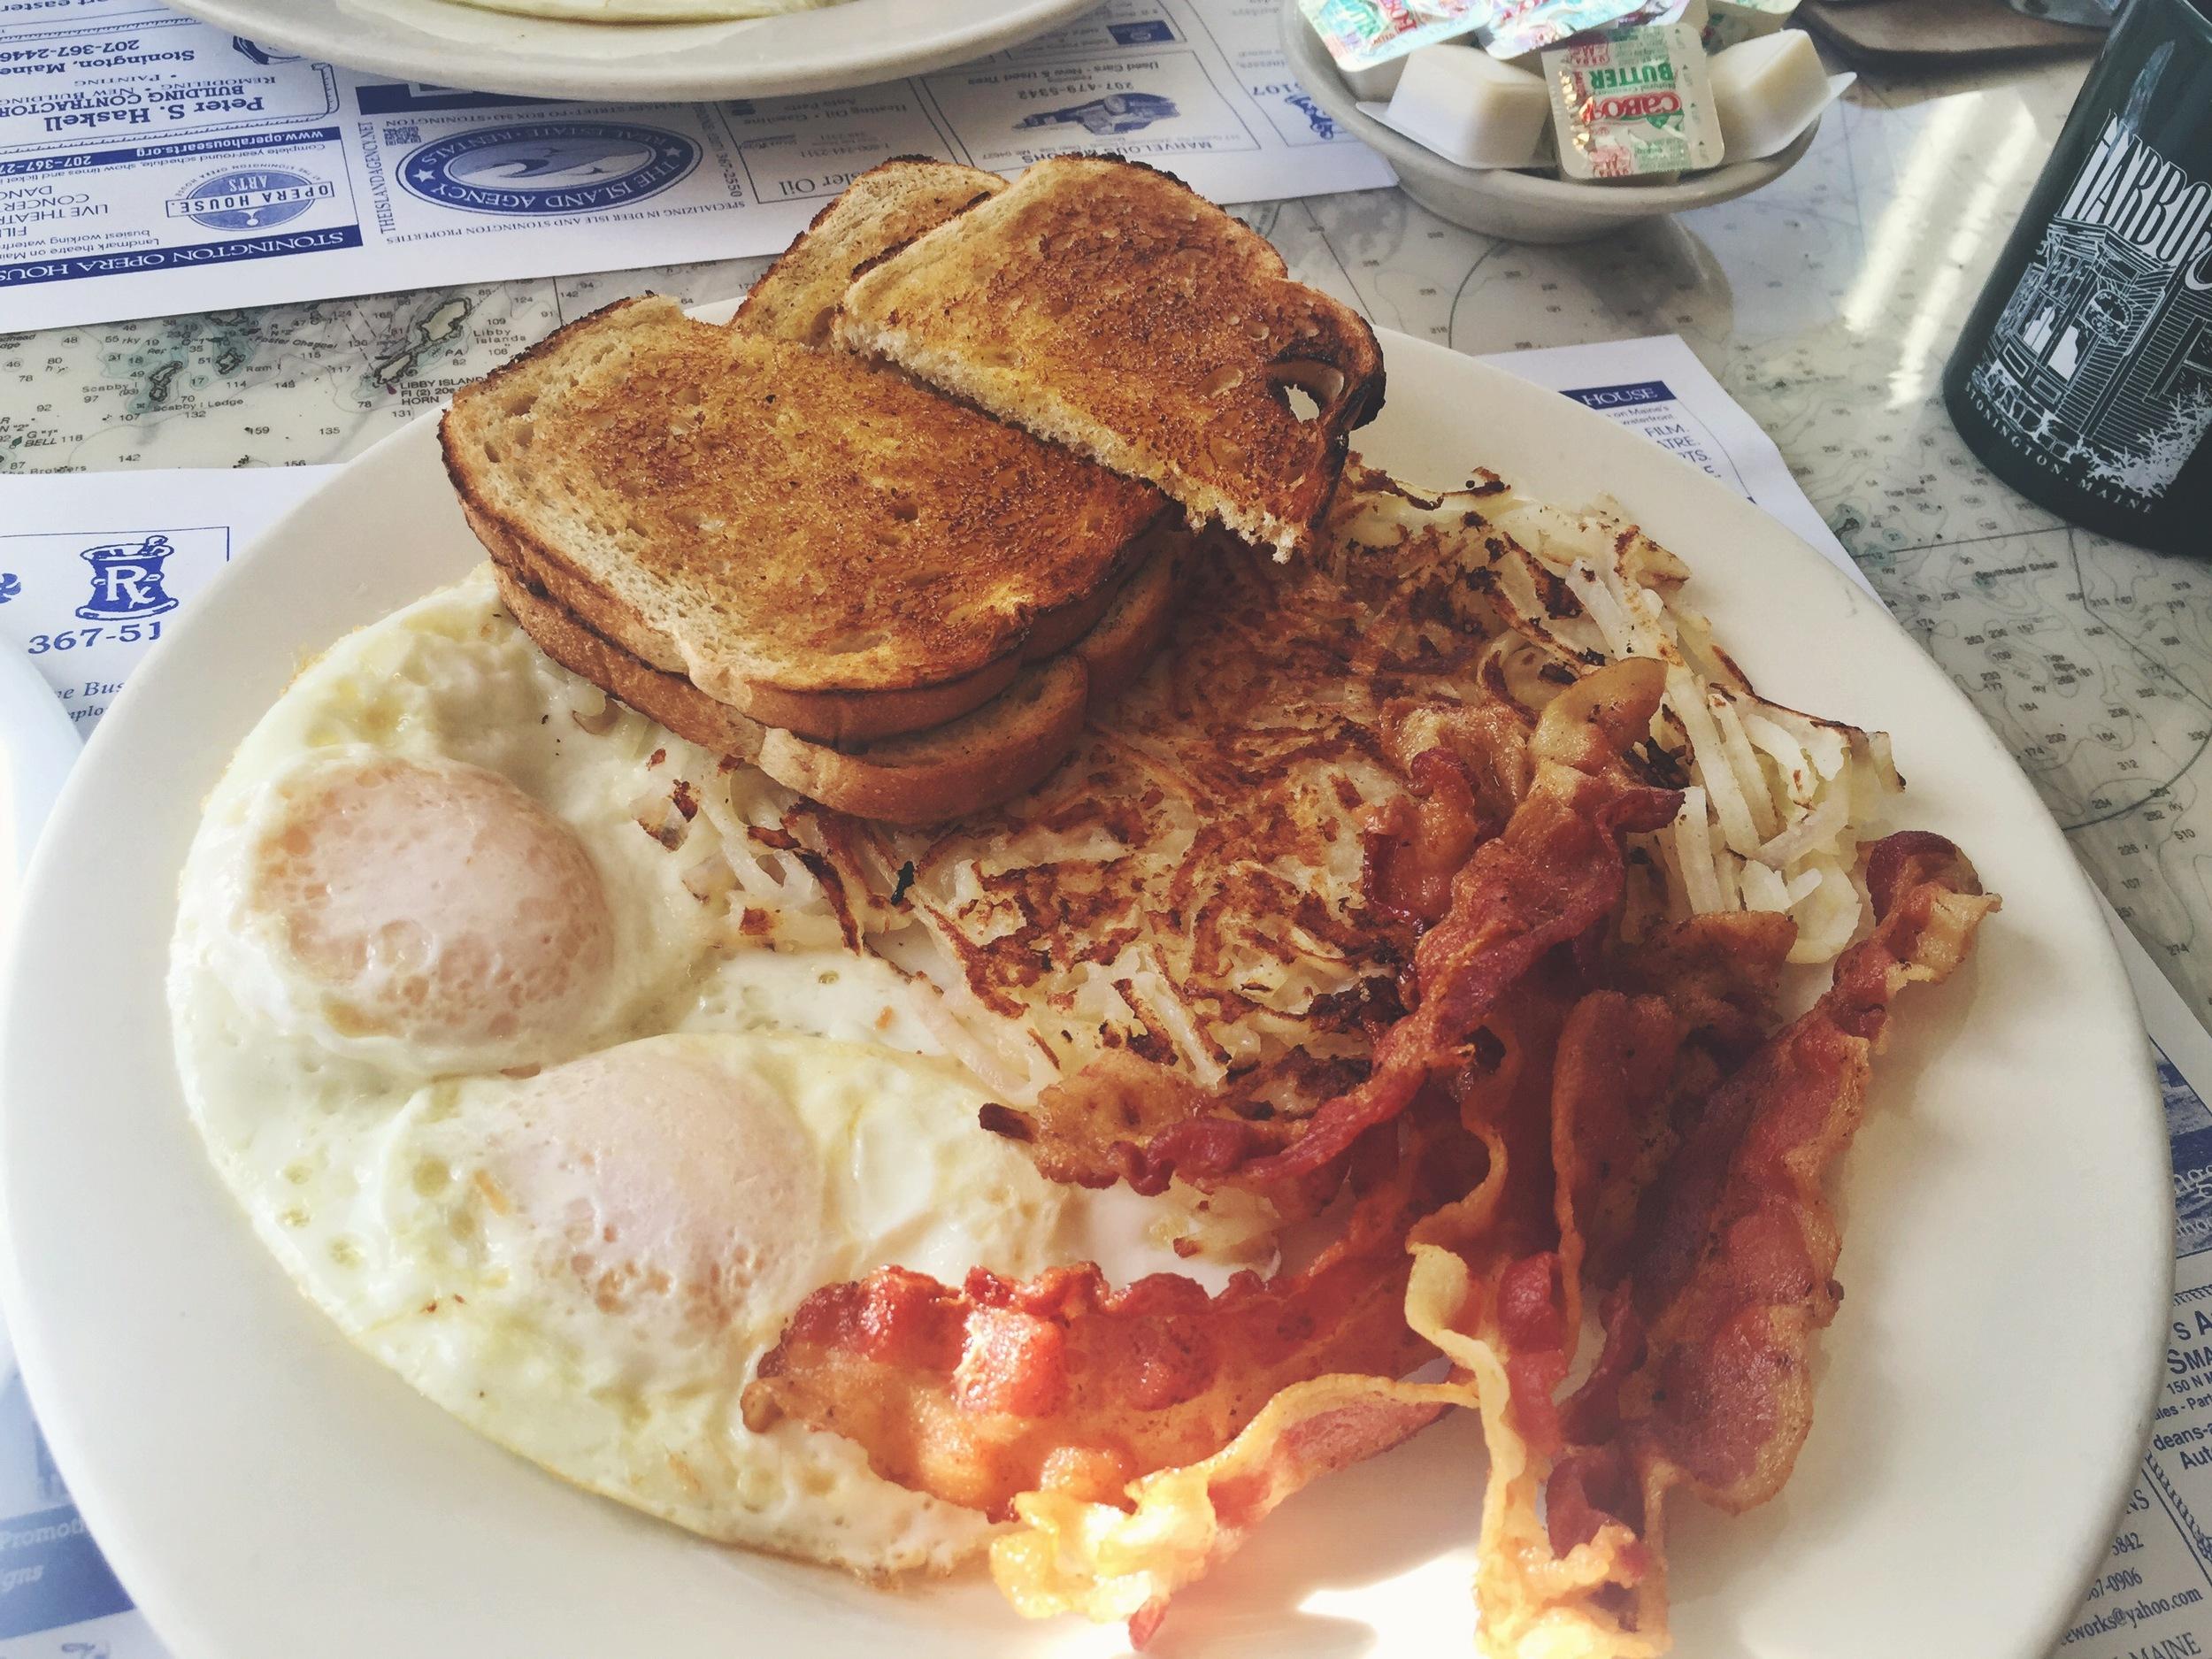 Every adventurer needs a hearty breakfast!